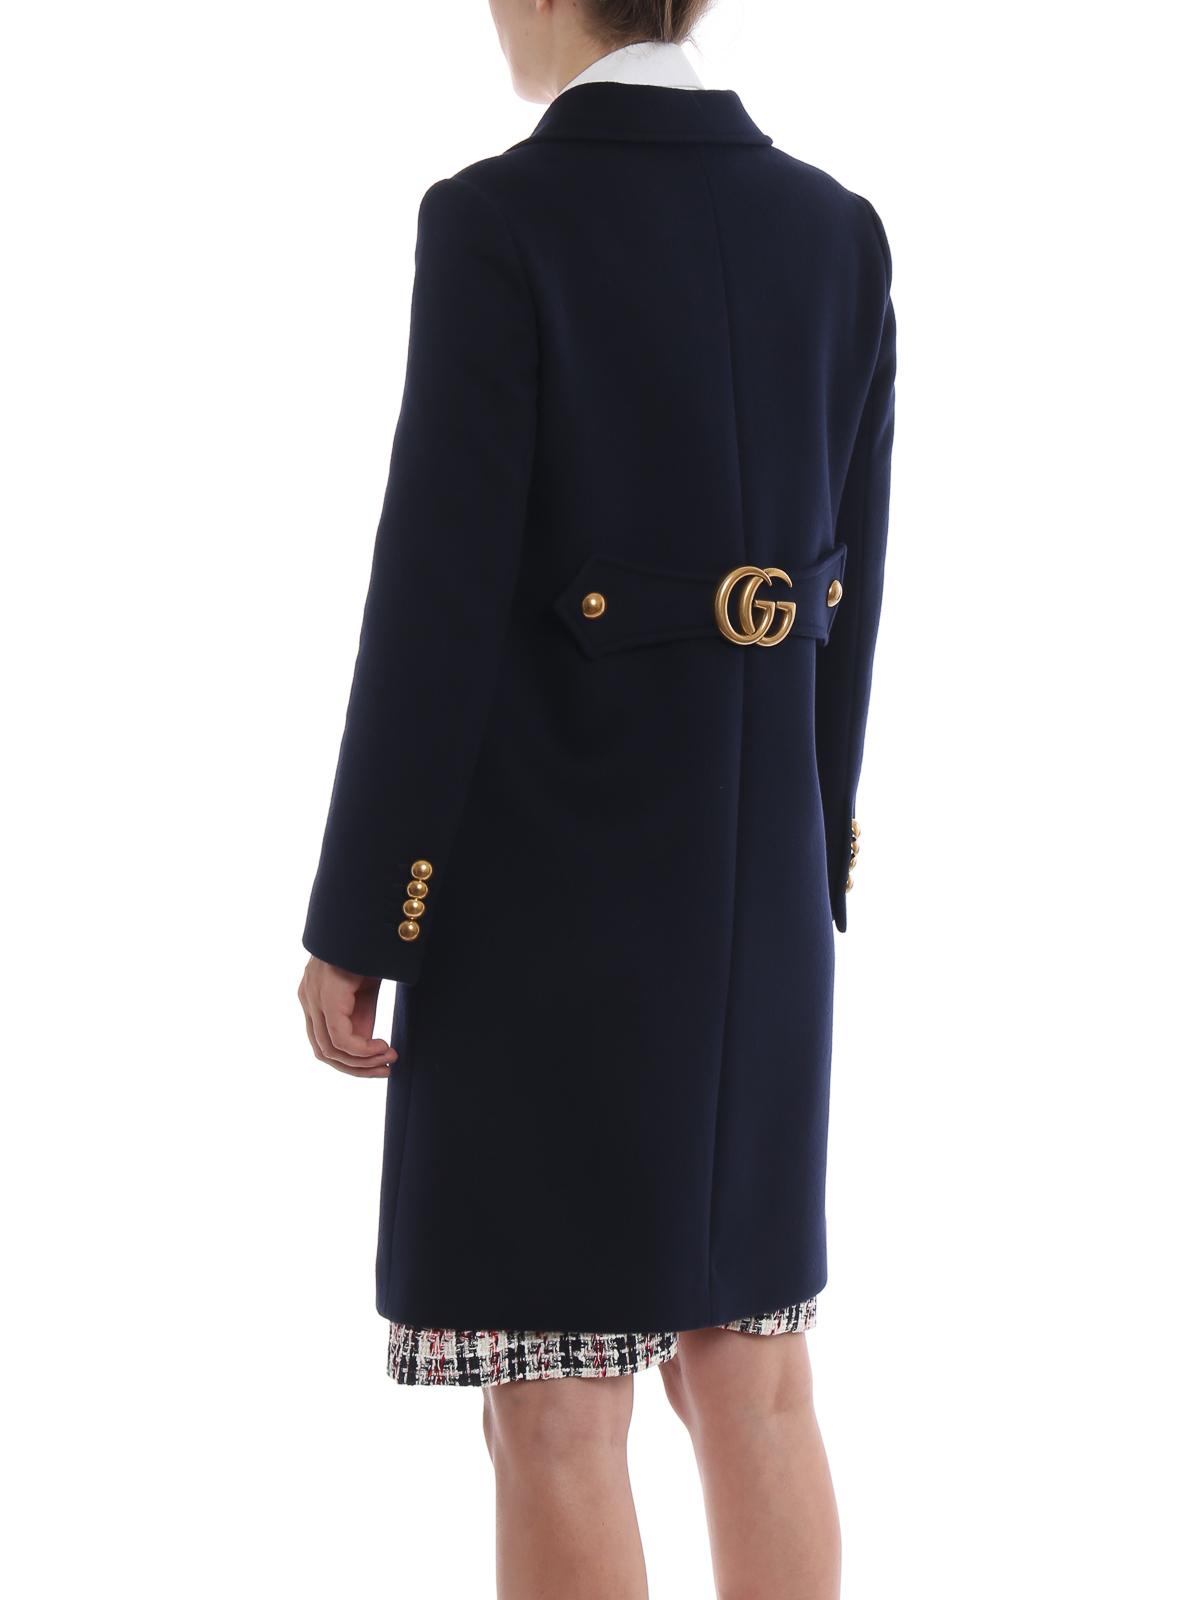 5f74b6c4dc Gucci - Abrigo Corto - Azul Oscuro - Abrigos cortos - 494500ZHW034474